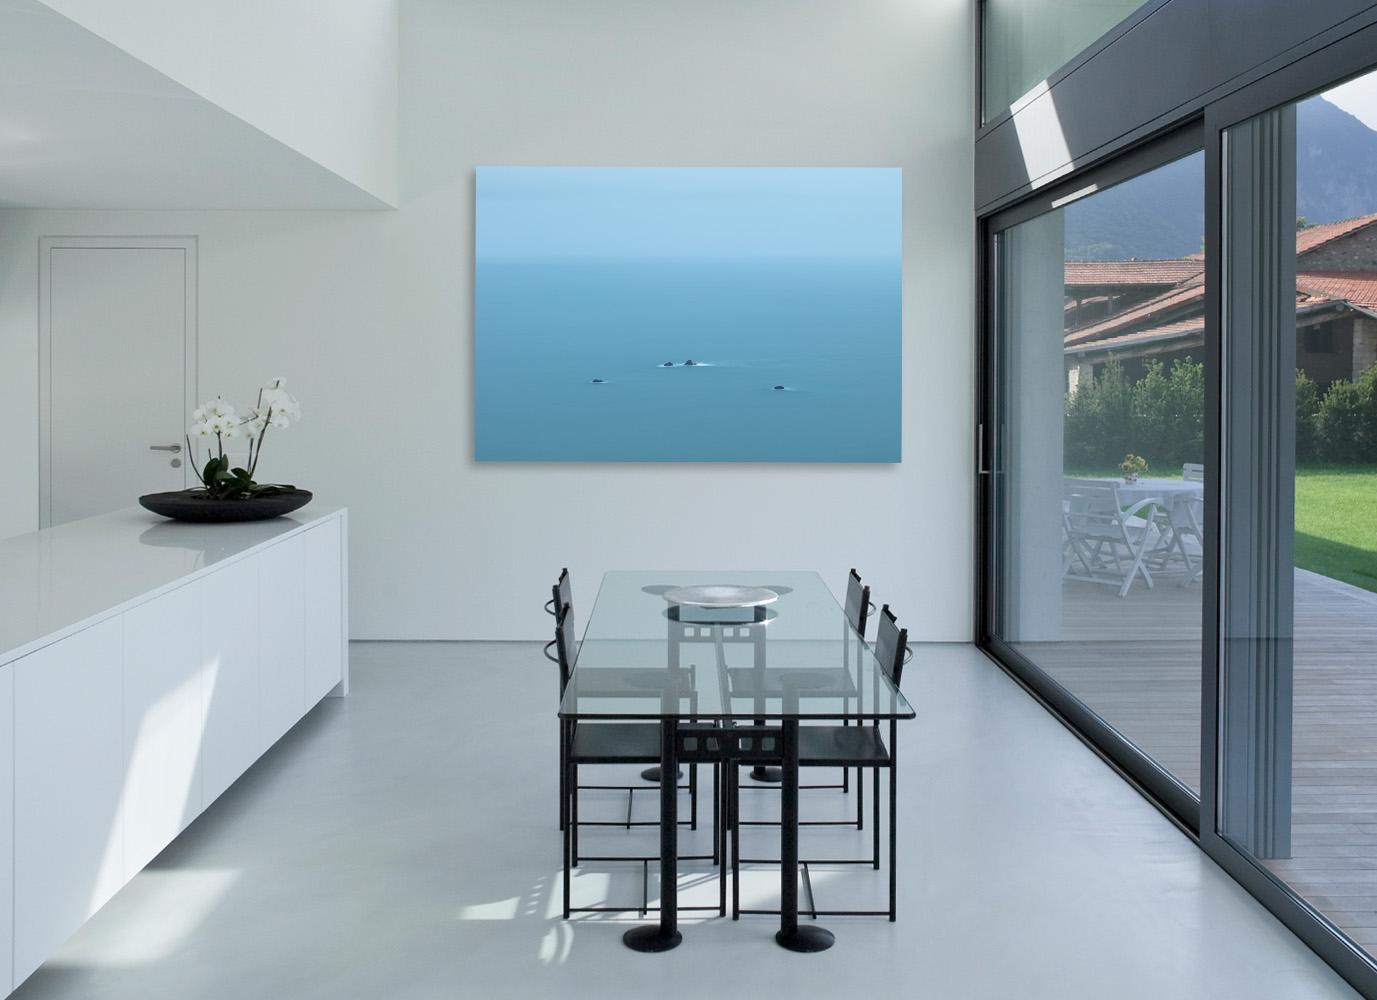 California Fine Art artwork luxury home decor seascape ocean sea stacks long exposure Michael Andrejkow